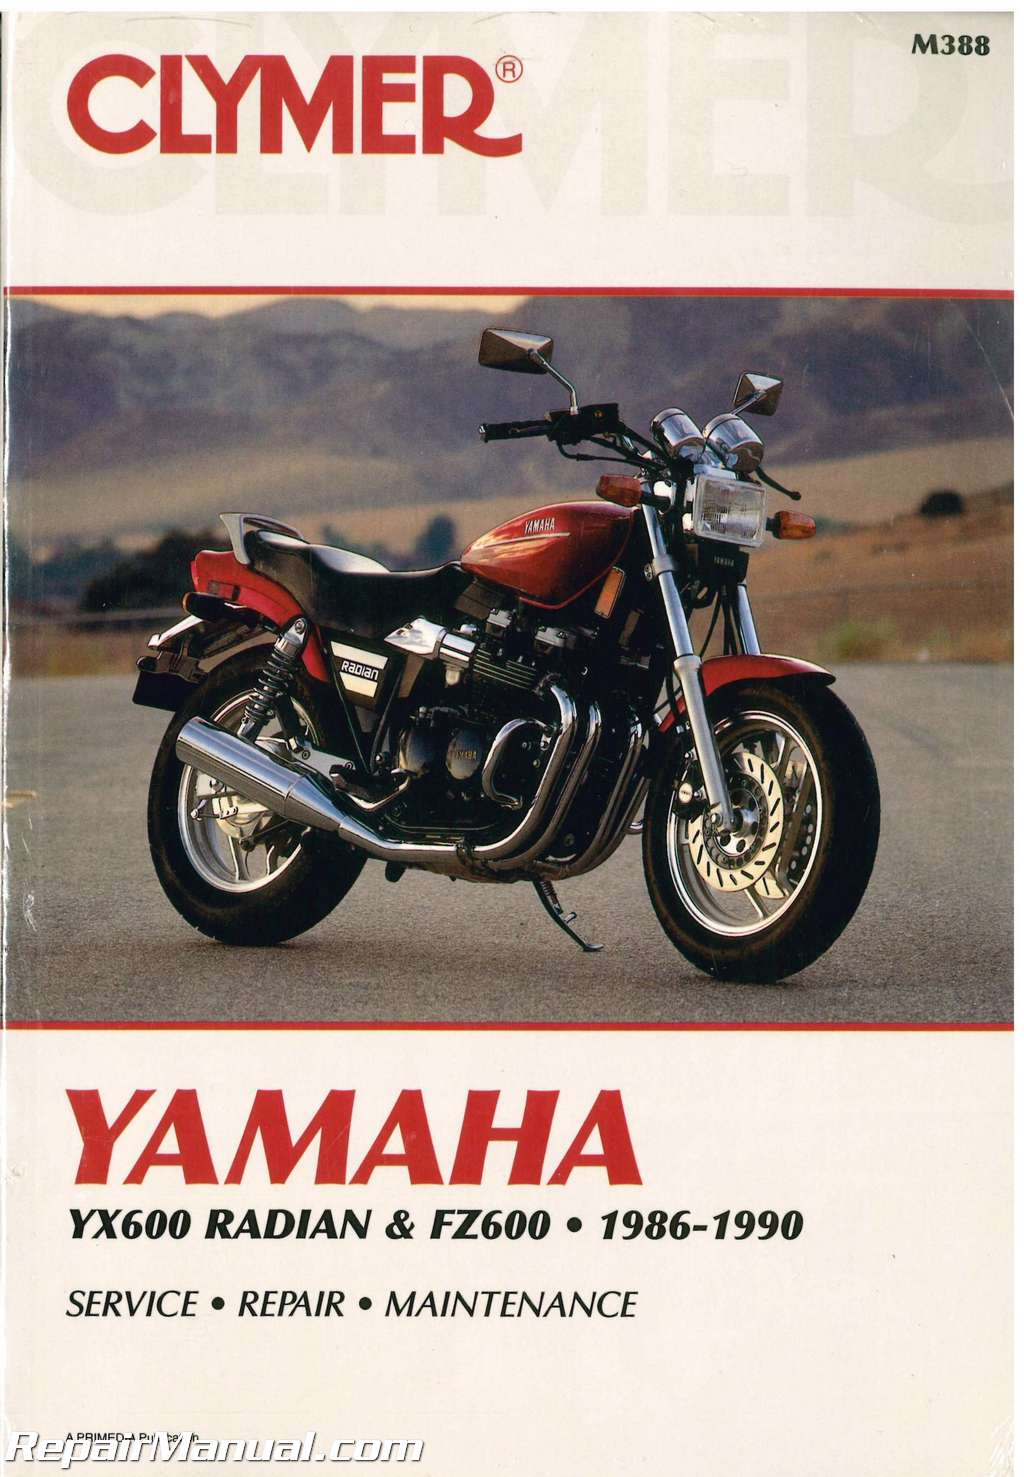 Diagram Of 1988 Radian Yx600u Yamaha Motorcycle Carburetor Diagram